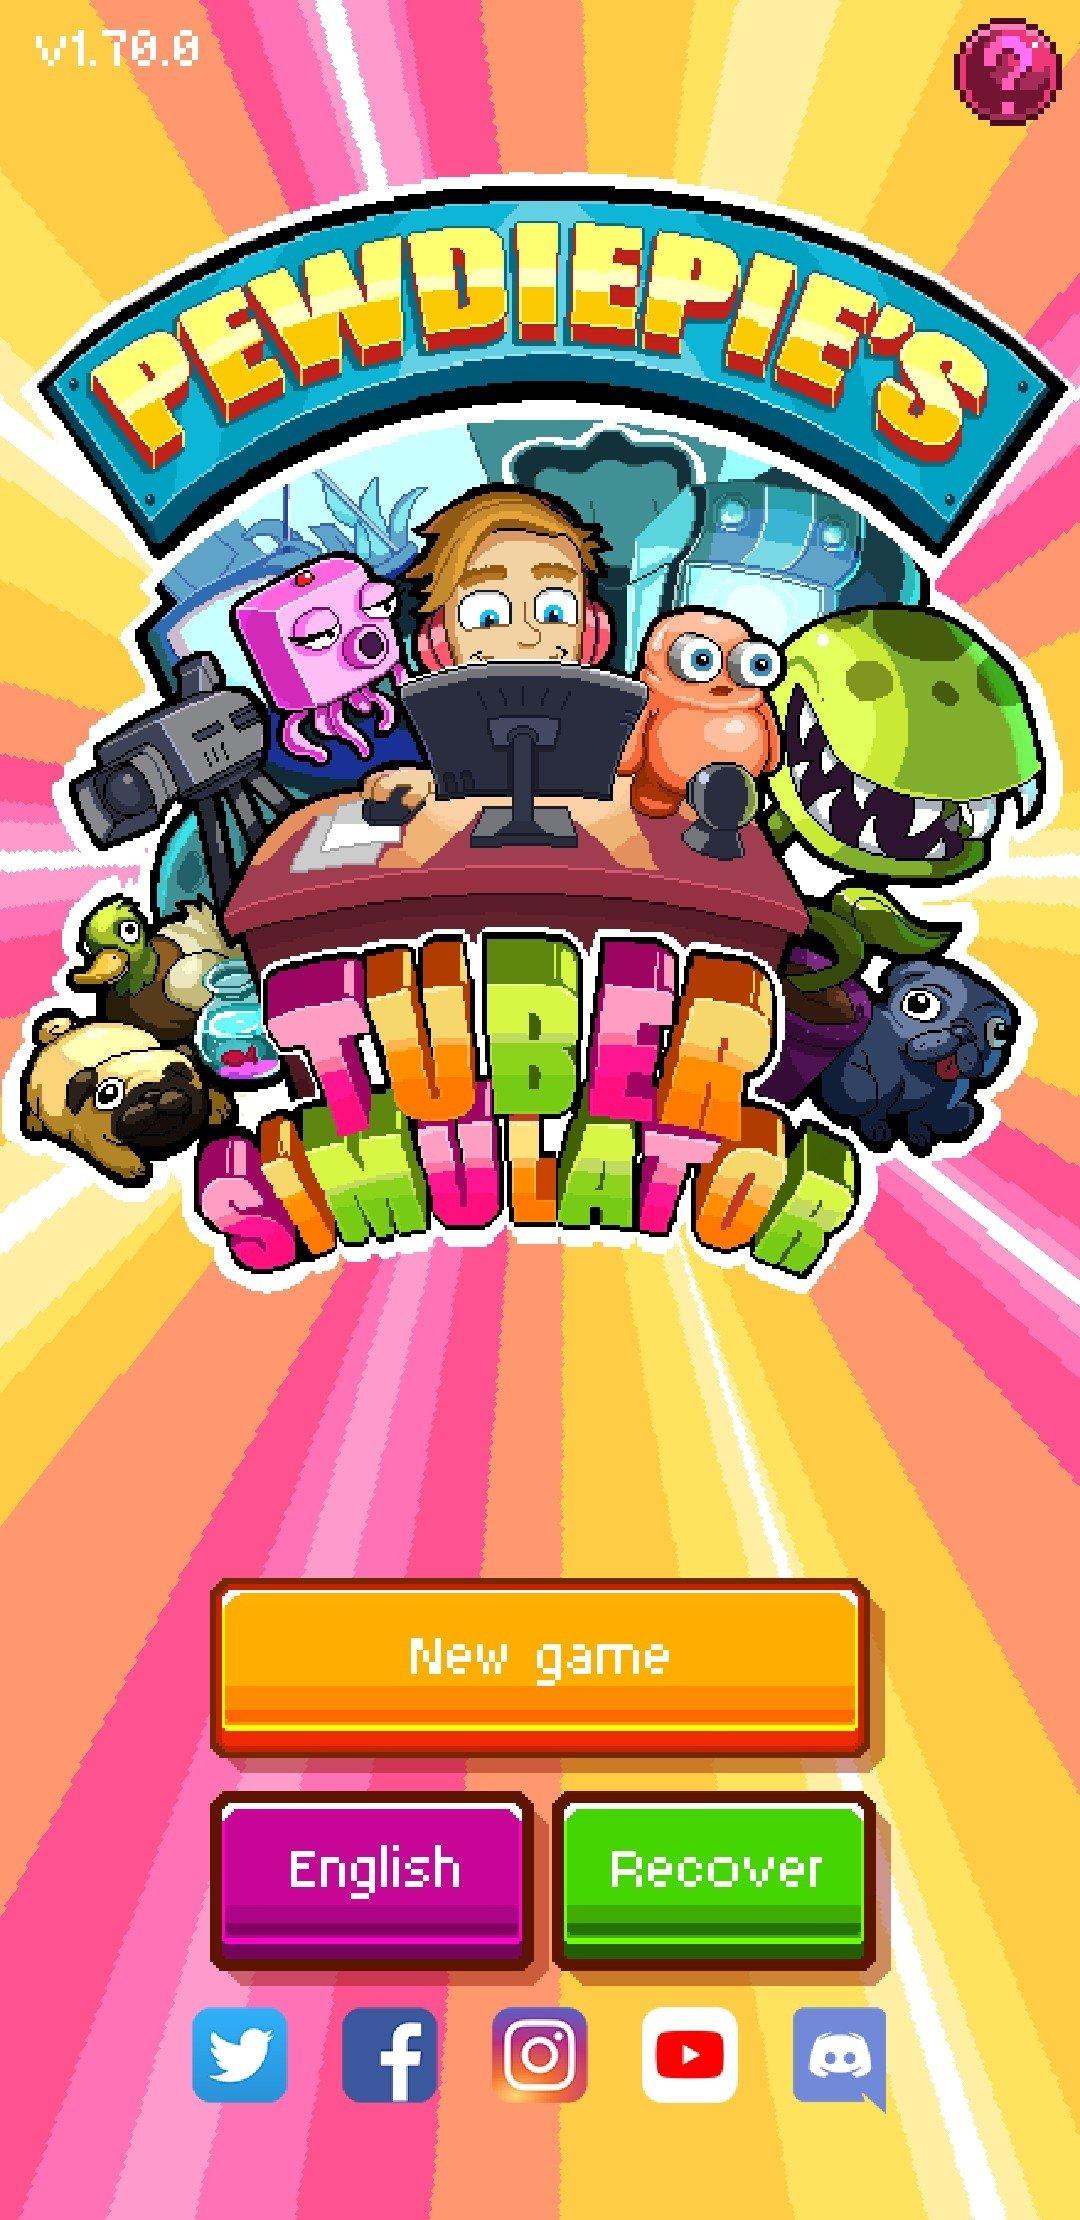 download pewdiepie s tuber simulator 1 22 0 android apk free